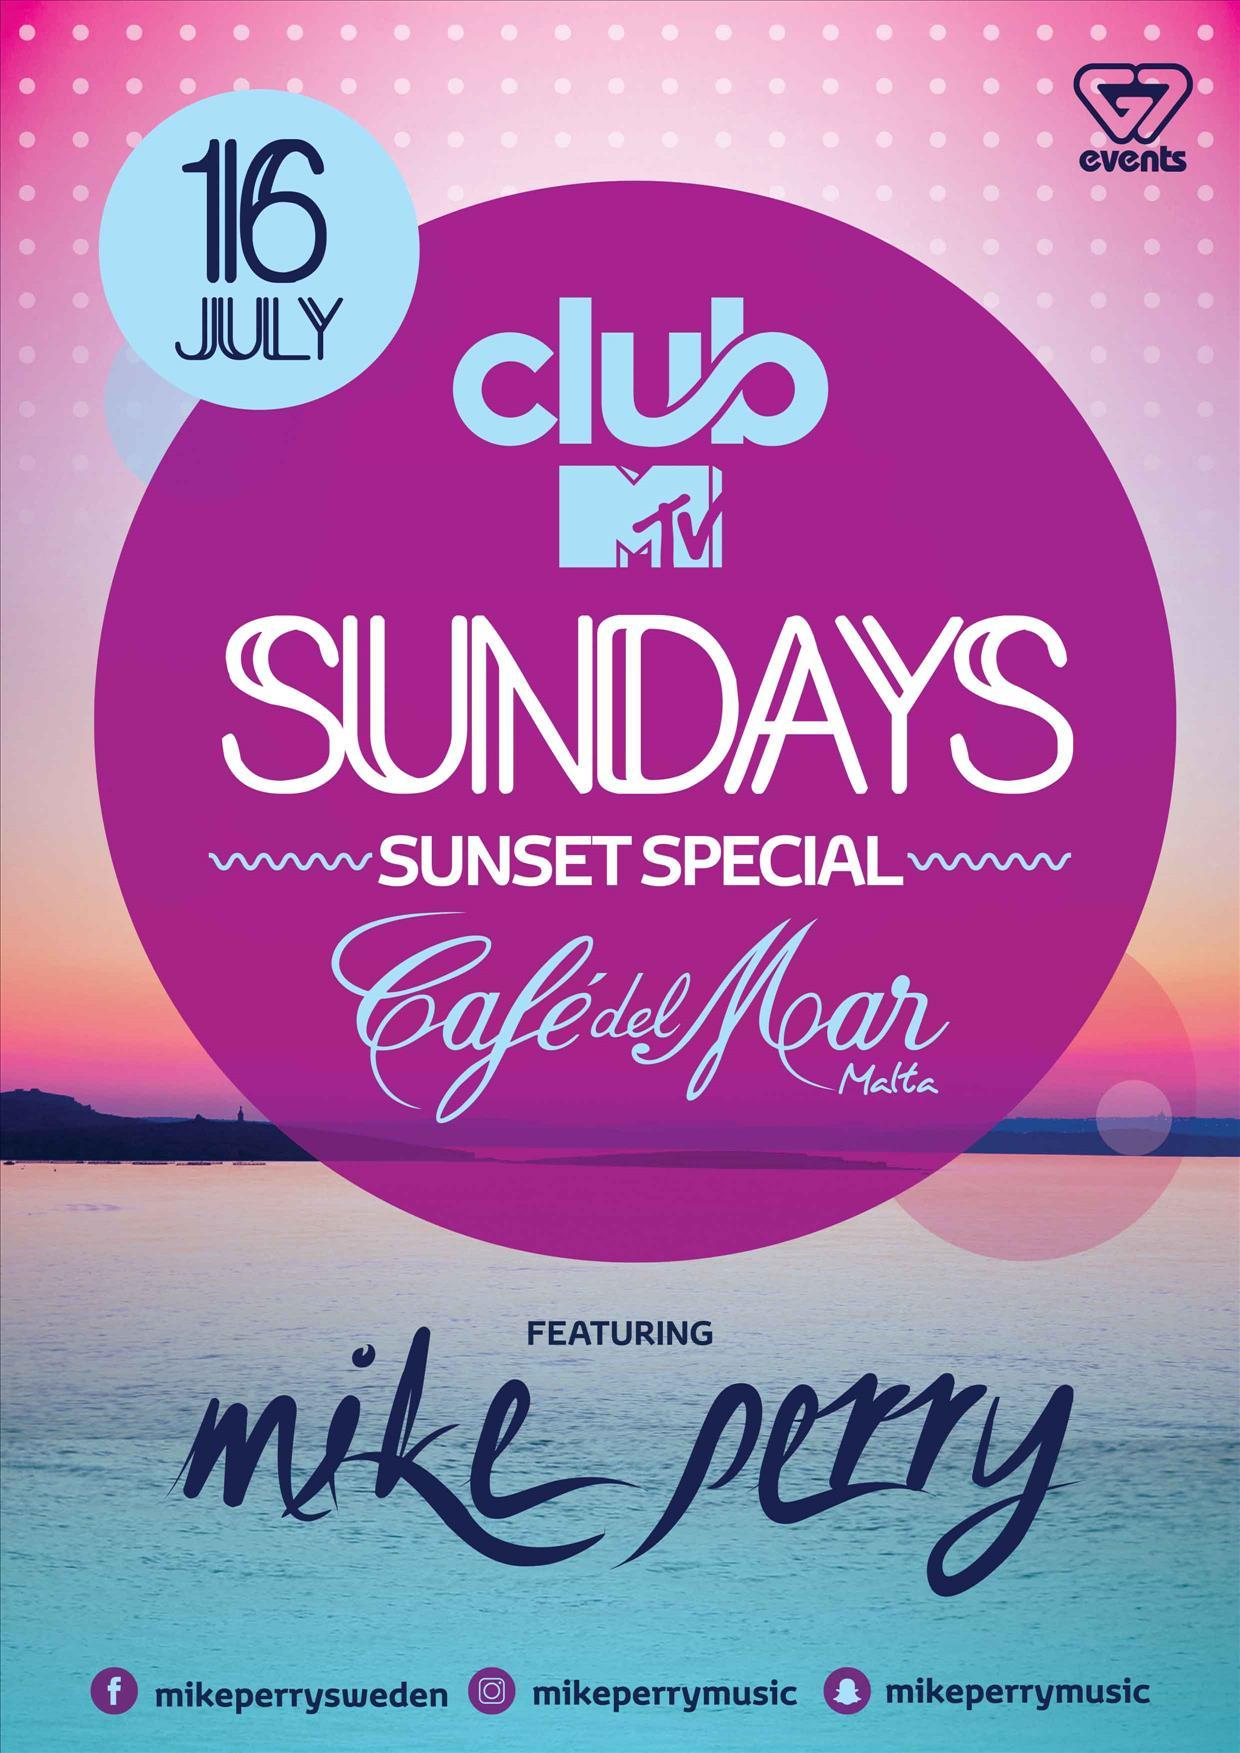 Club MTV Sundays present MIKE PERRY flyer